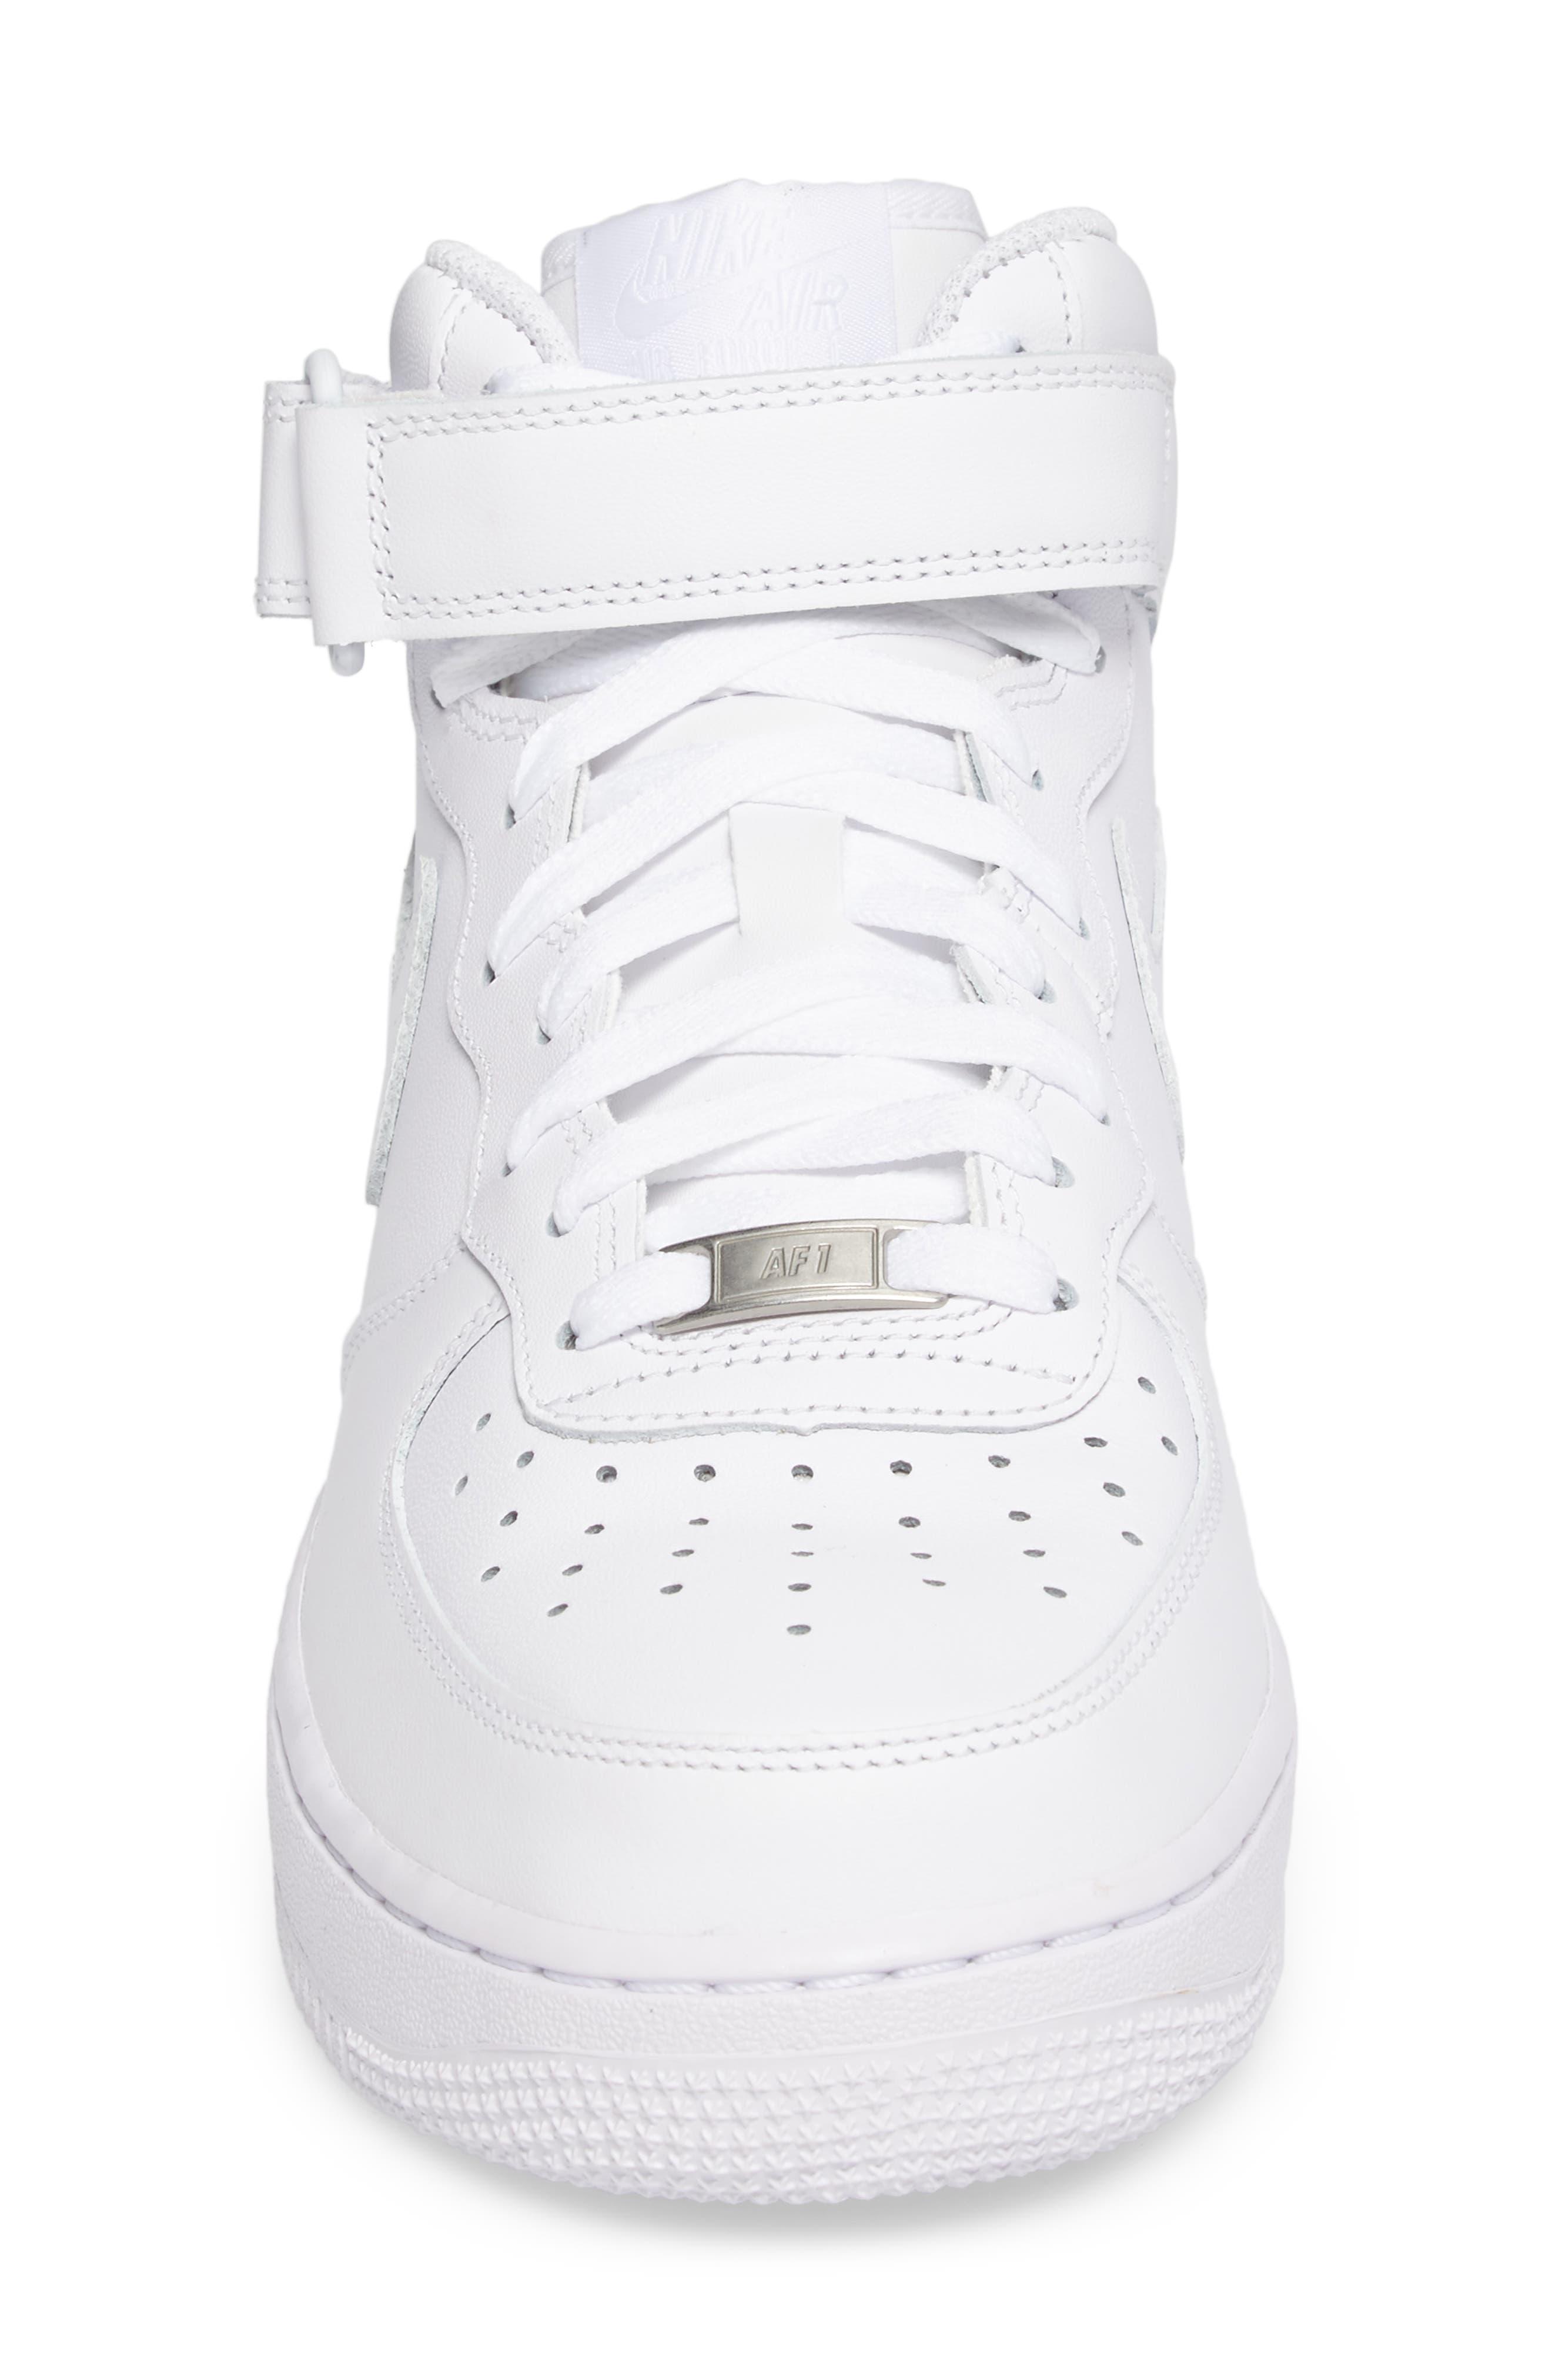 Air Force 1 Mid '07 Sneaker,                             Alternate thumbnail 4, color,                             White/ White